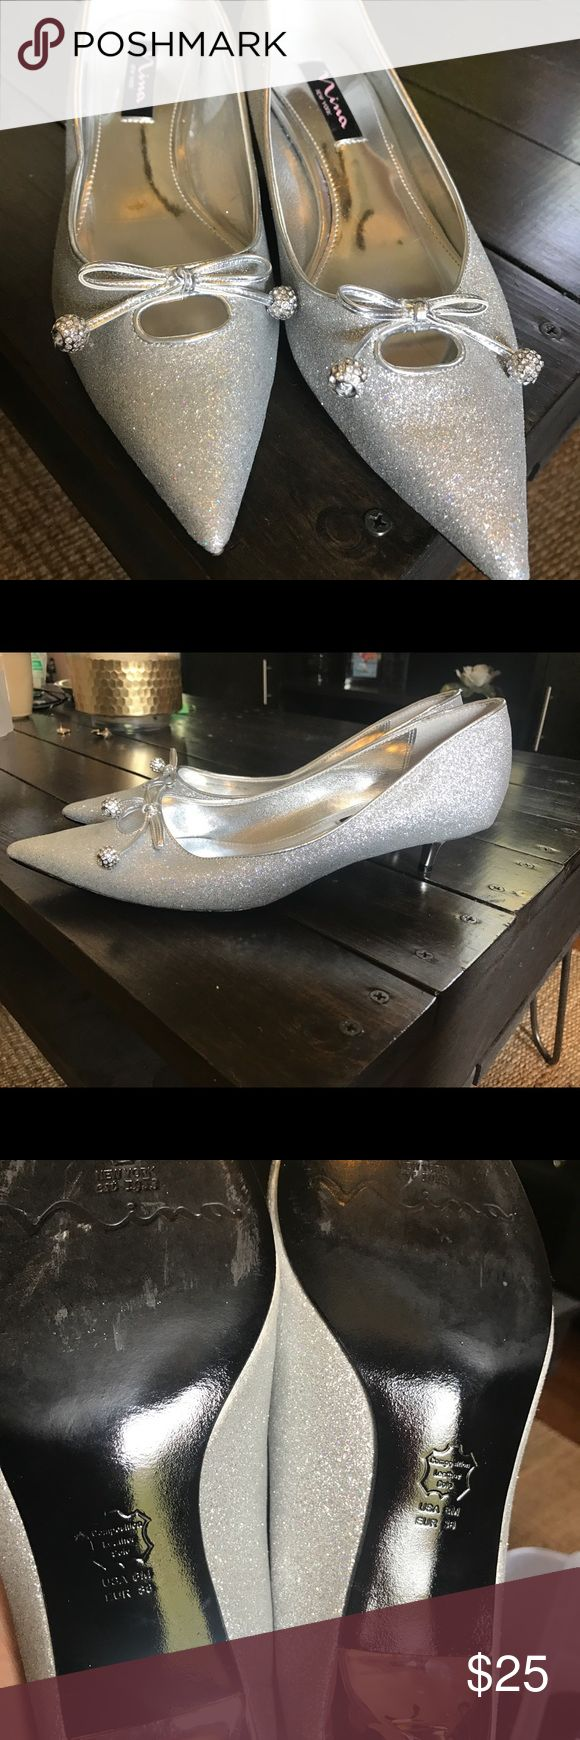 Silver kitten heels에 관•œ 상위 25개 이상의 Pinterest 아이디어